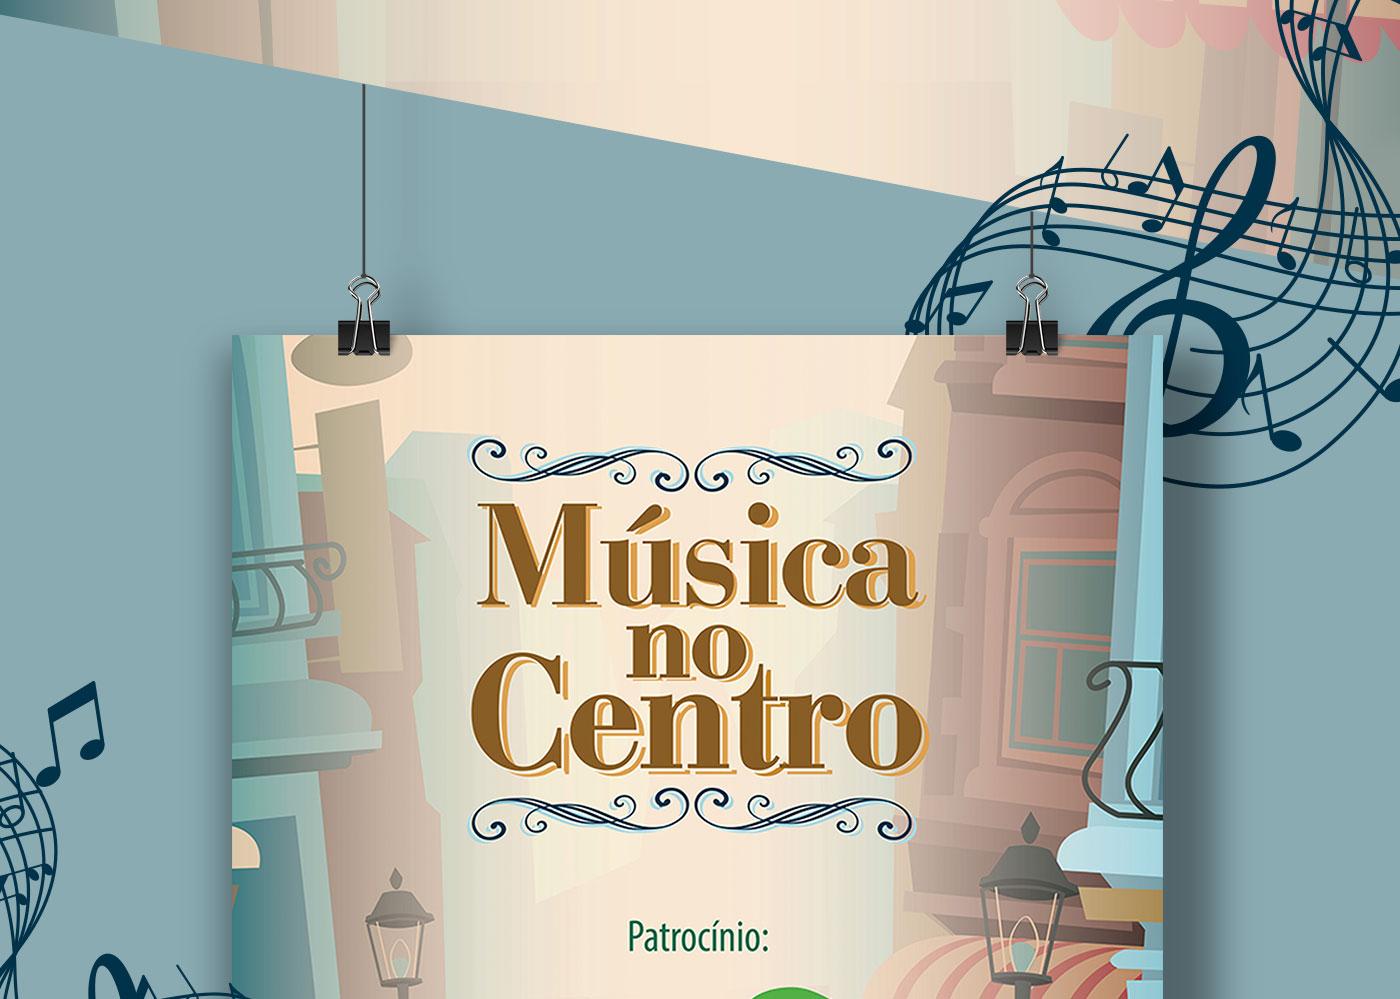 MOCKUP-MUSICA-CENTRO-ECOPORTO-BEHANCE_01_02